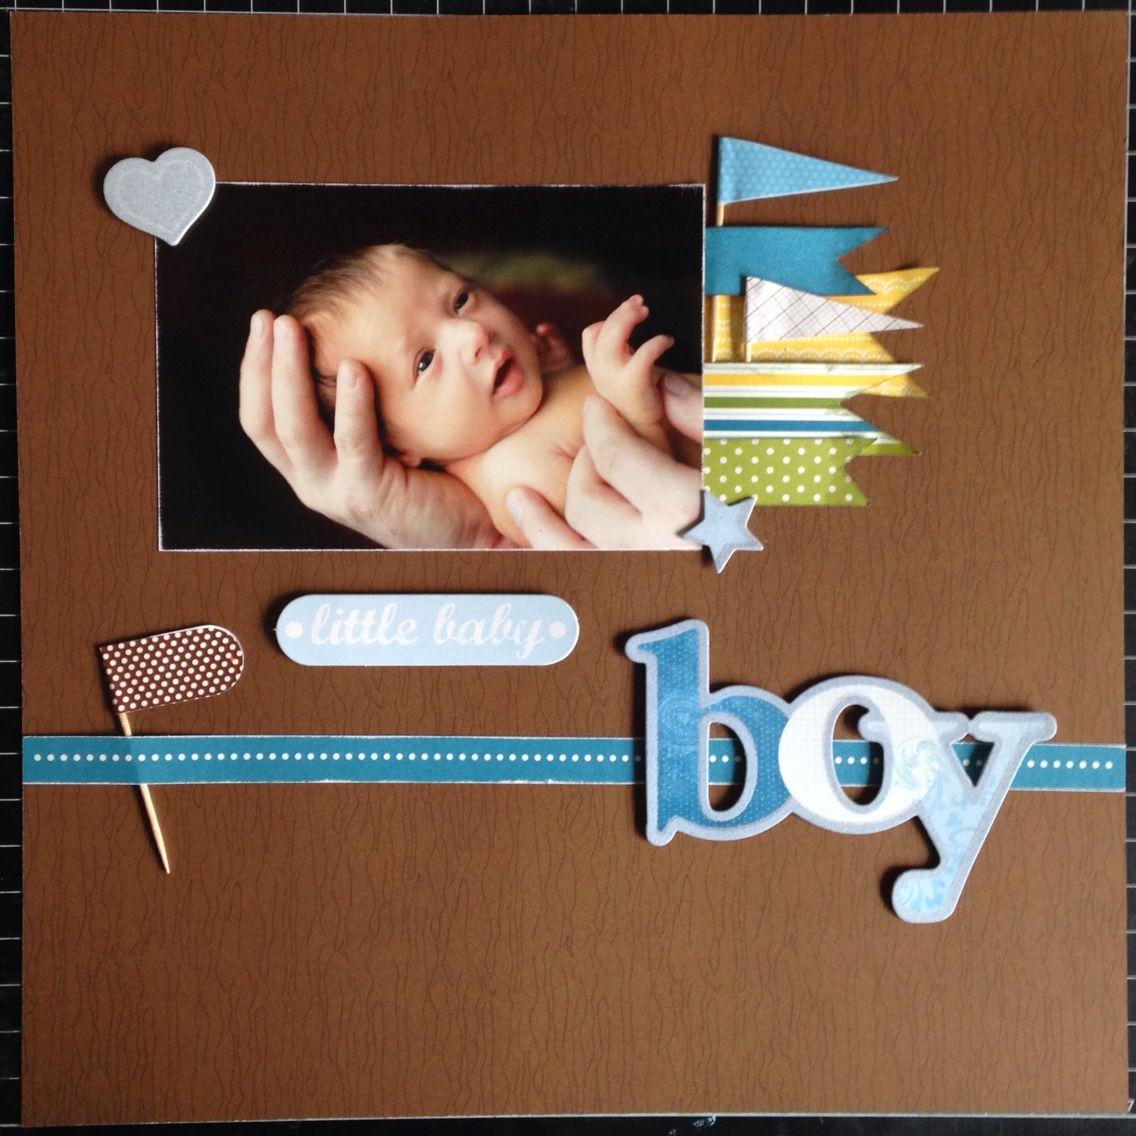 Paper used: @pebblesinc  - Family Ties Pebbles - Toothpick Flags Me & My Big Ideas - Mambi Sticks stickers  Jaxen - January 5, 2013